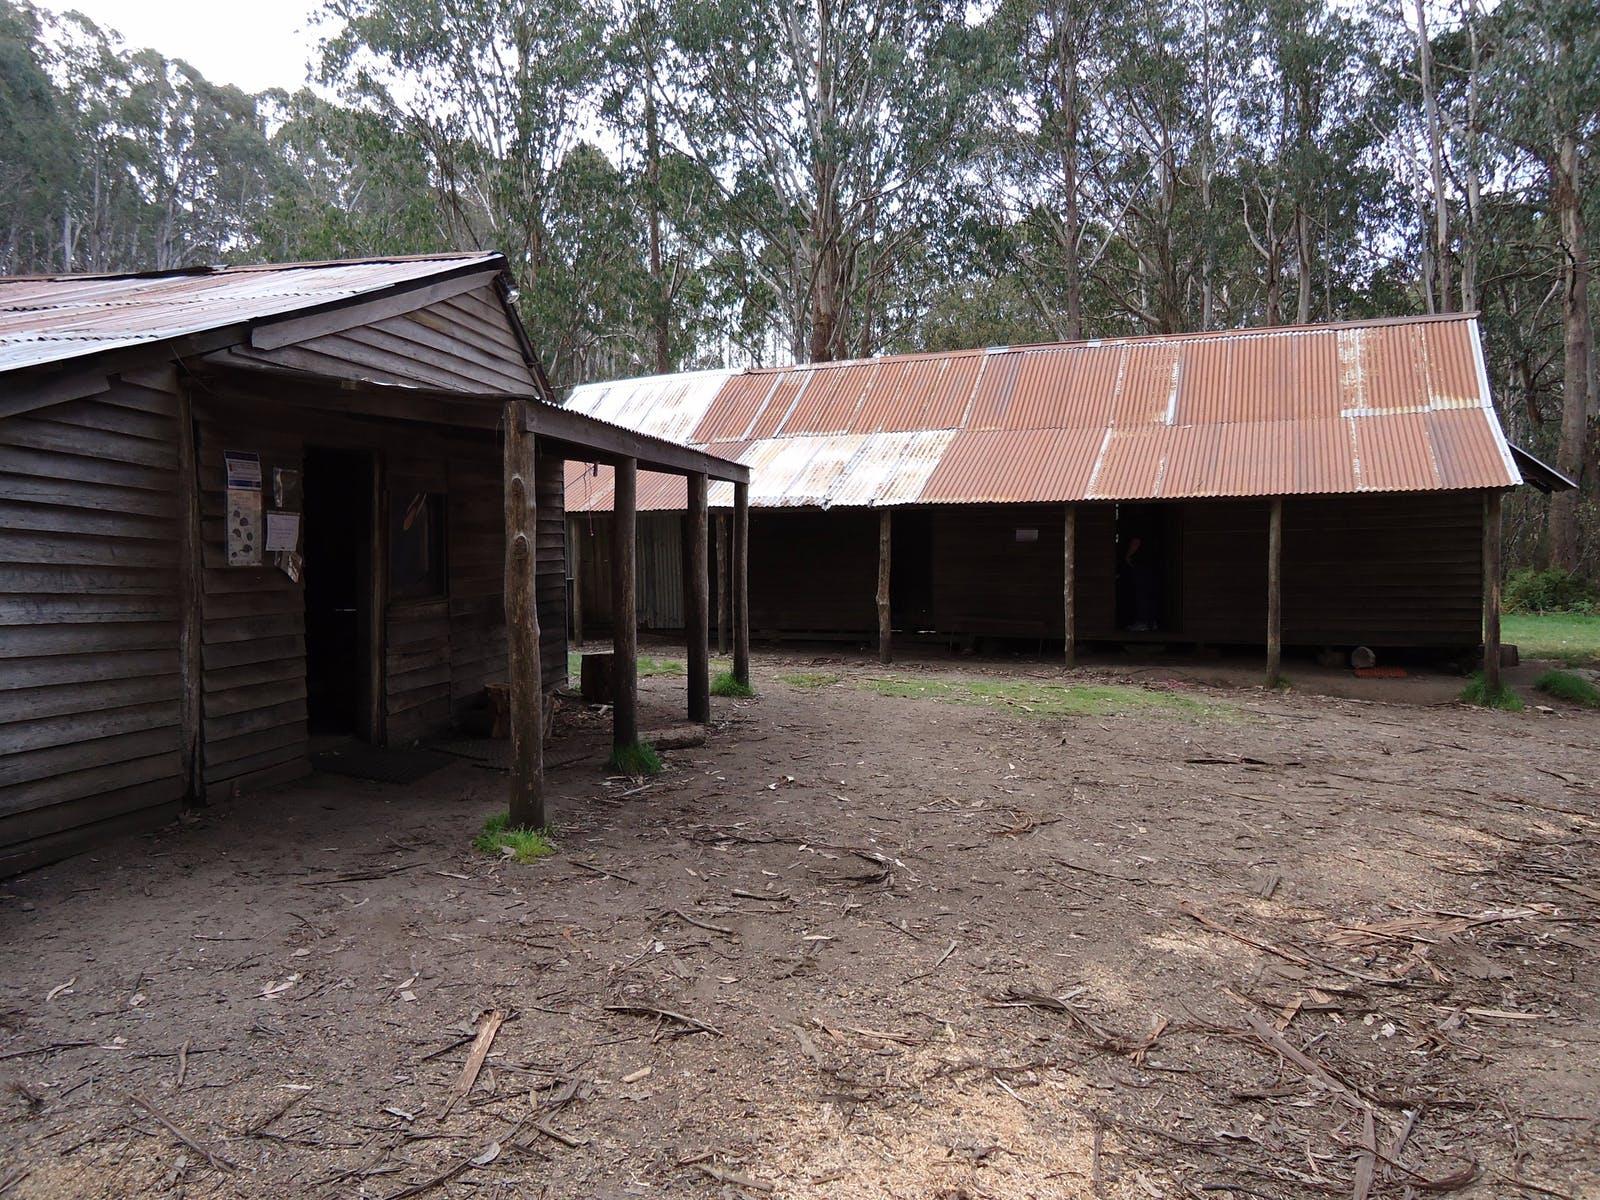 Razorback Hut